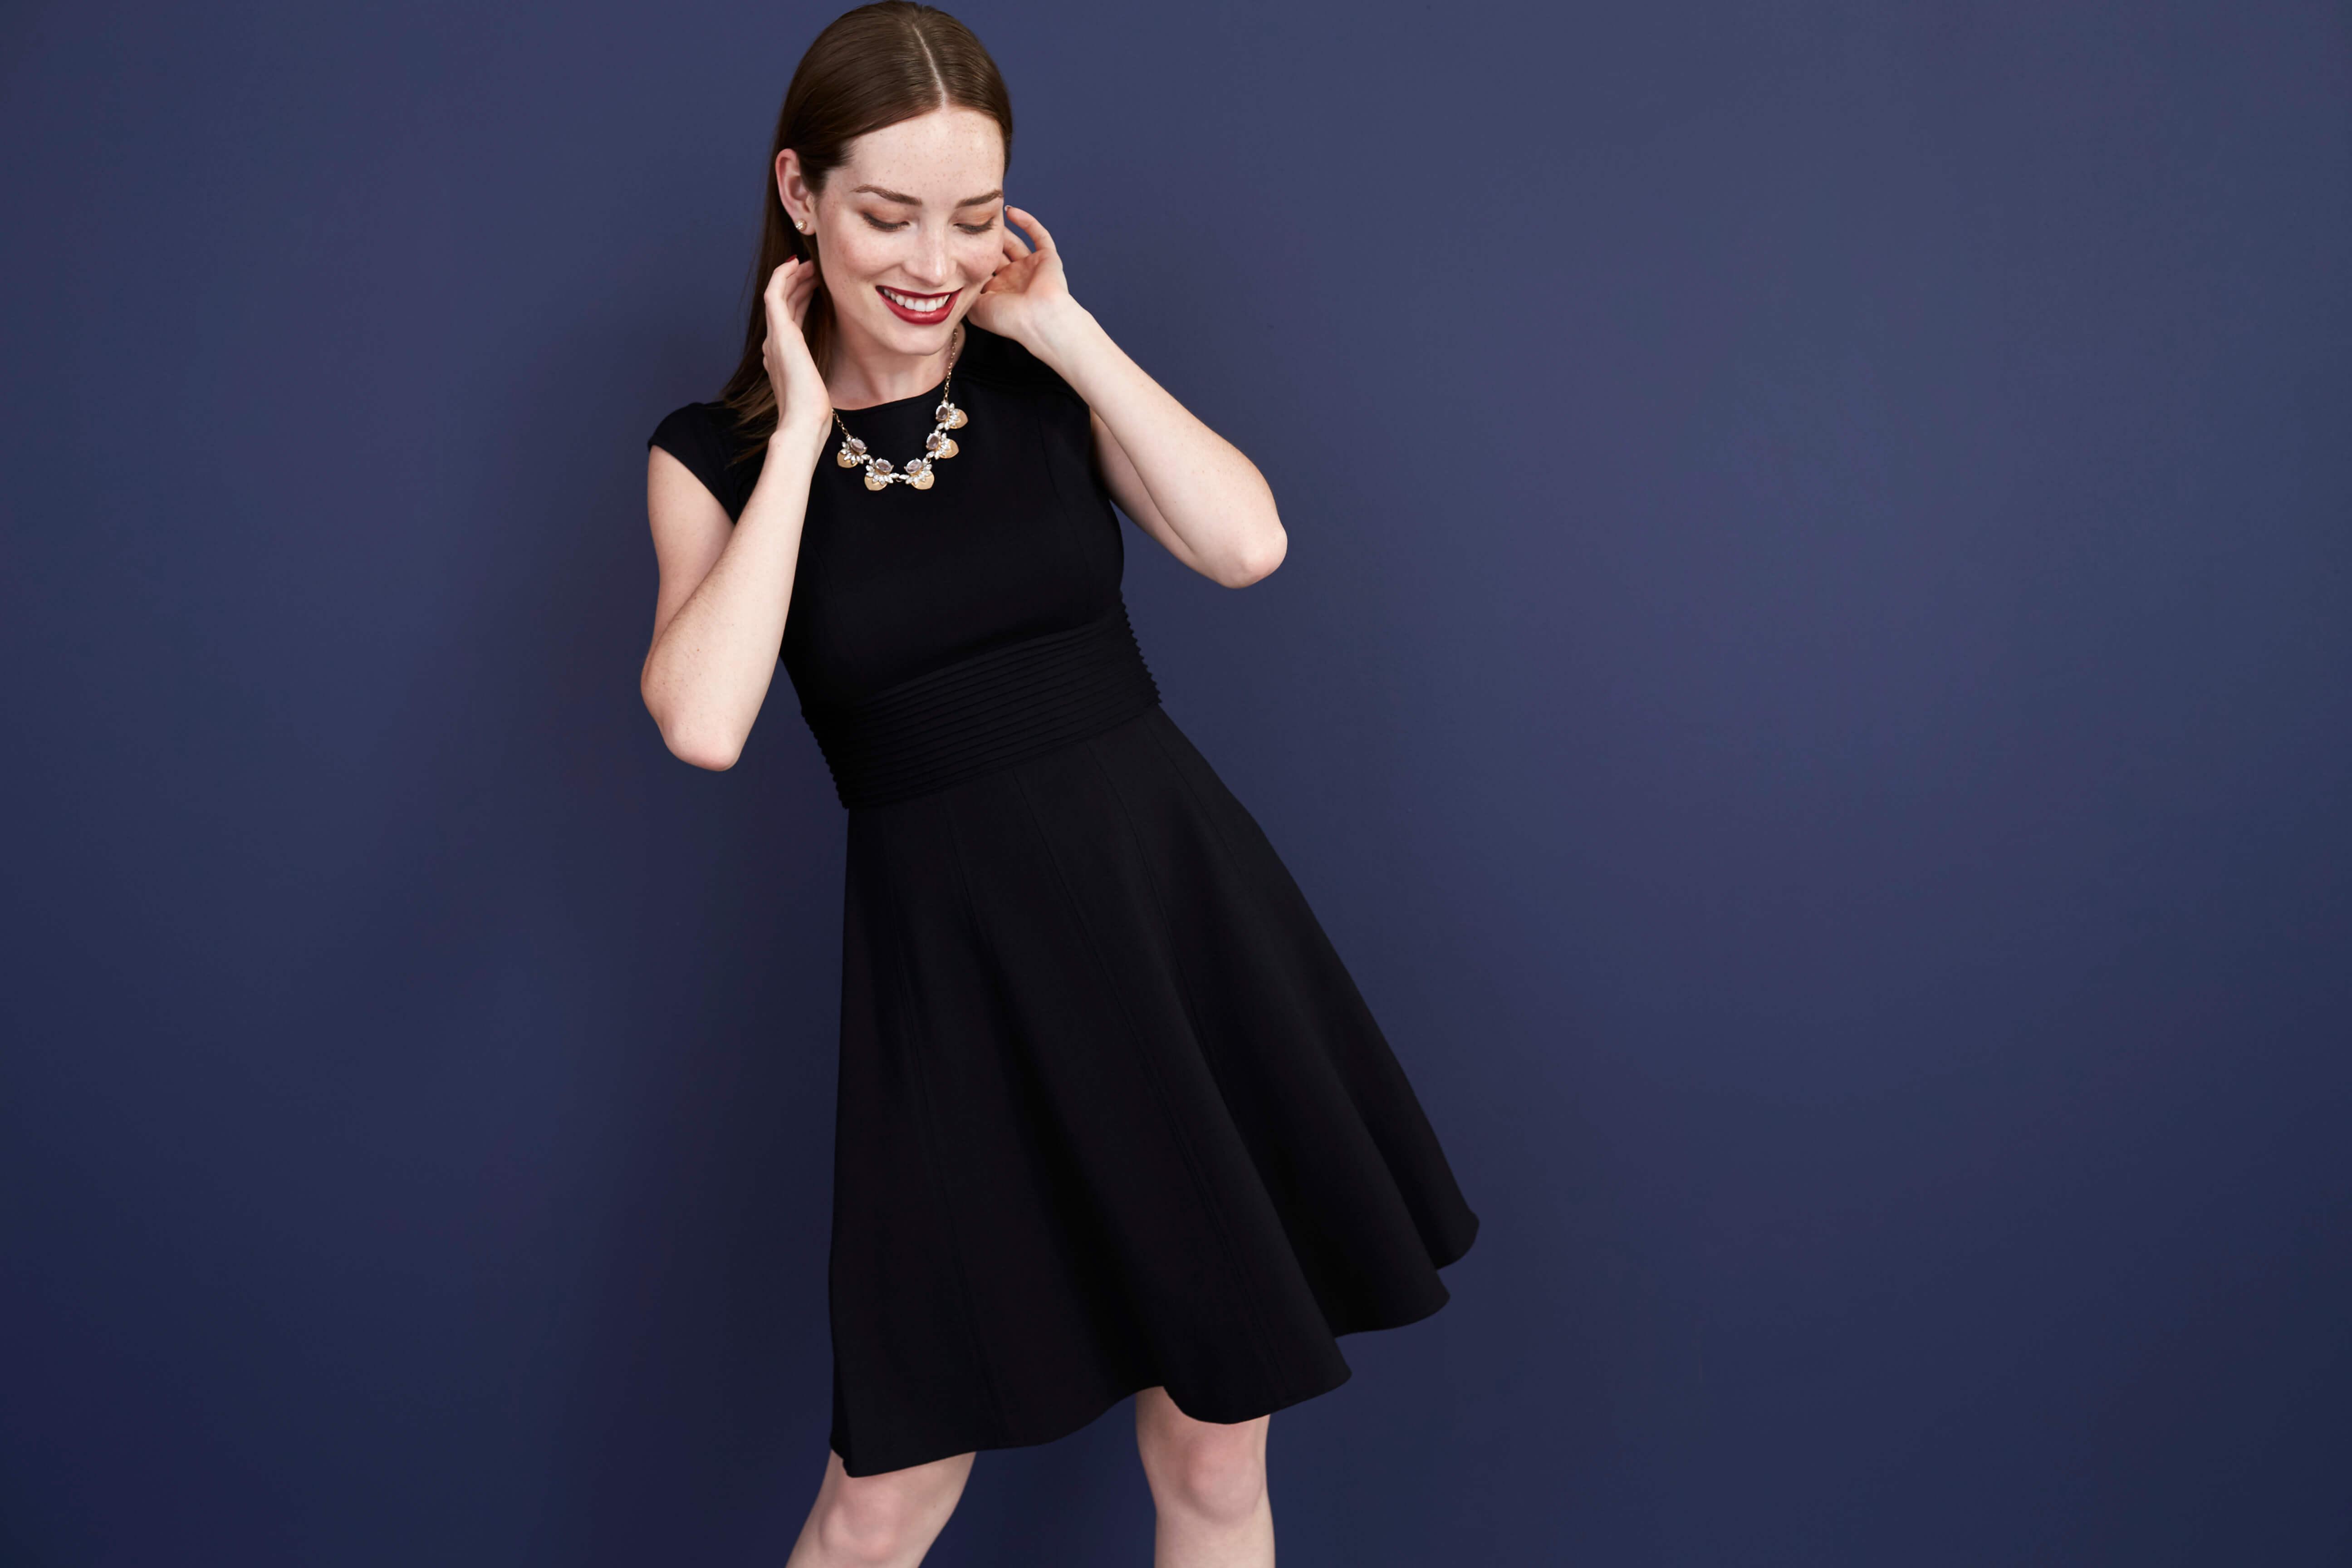 10-11_w_hol16_the-little-black-dress-3-ways_10w2_v13_0631